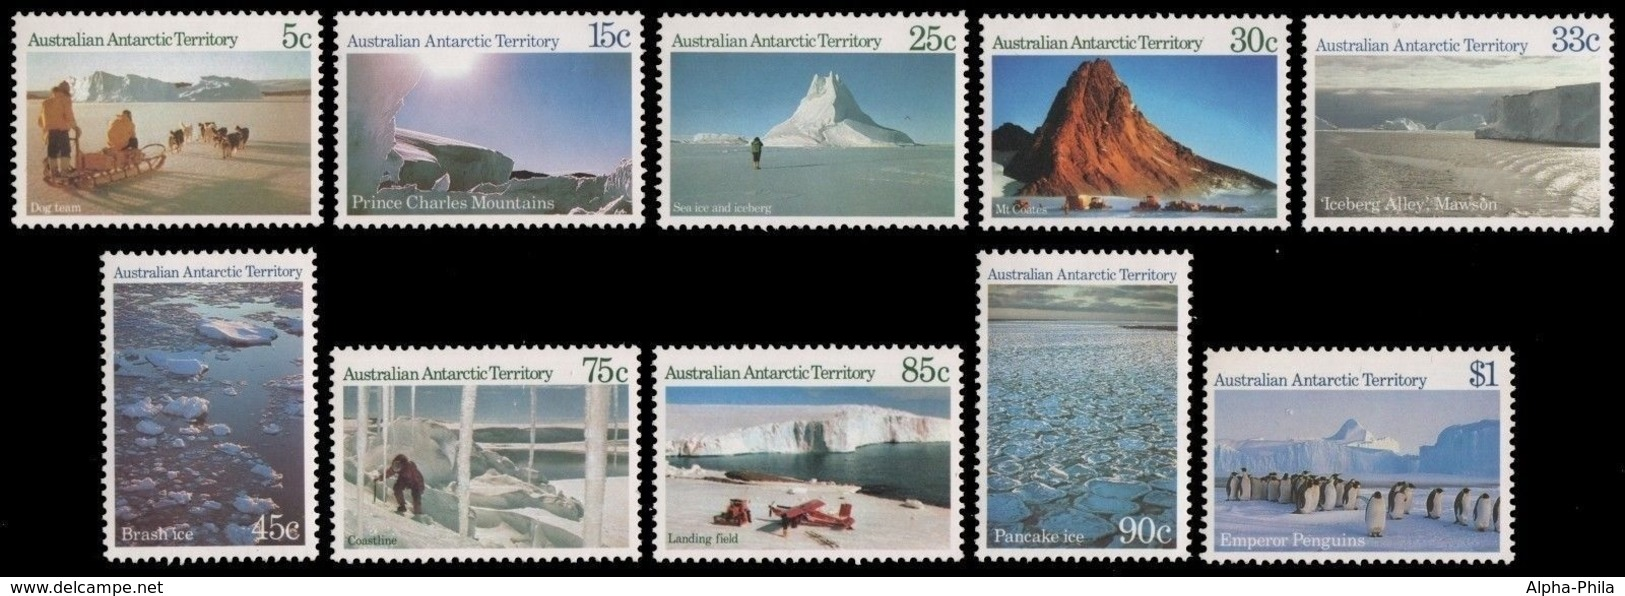 AAT / Austral. Antarktis 1973 - Mi-Nr. 63-72 ** - MNH - Natur-Landschaften - Australian Antarctic Territory (AAT)